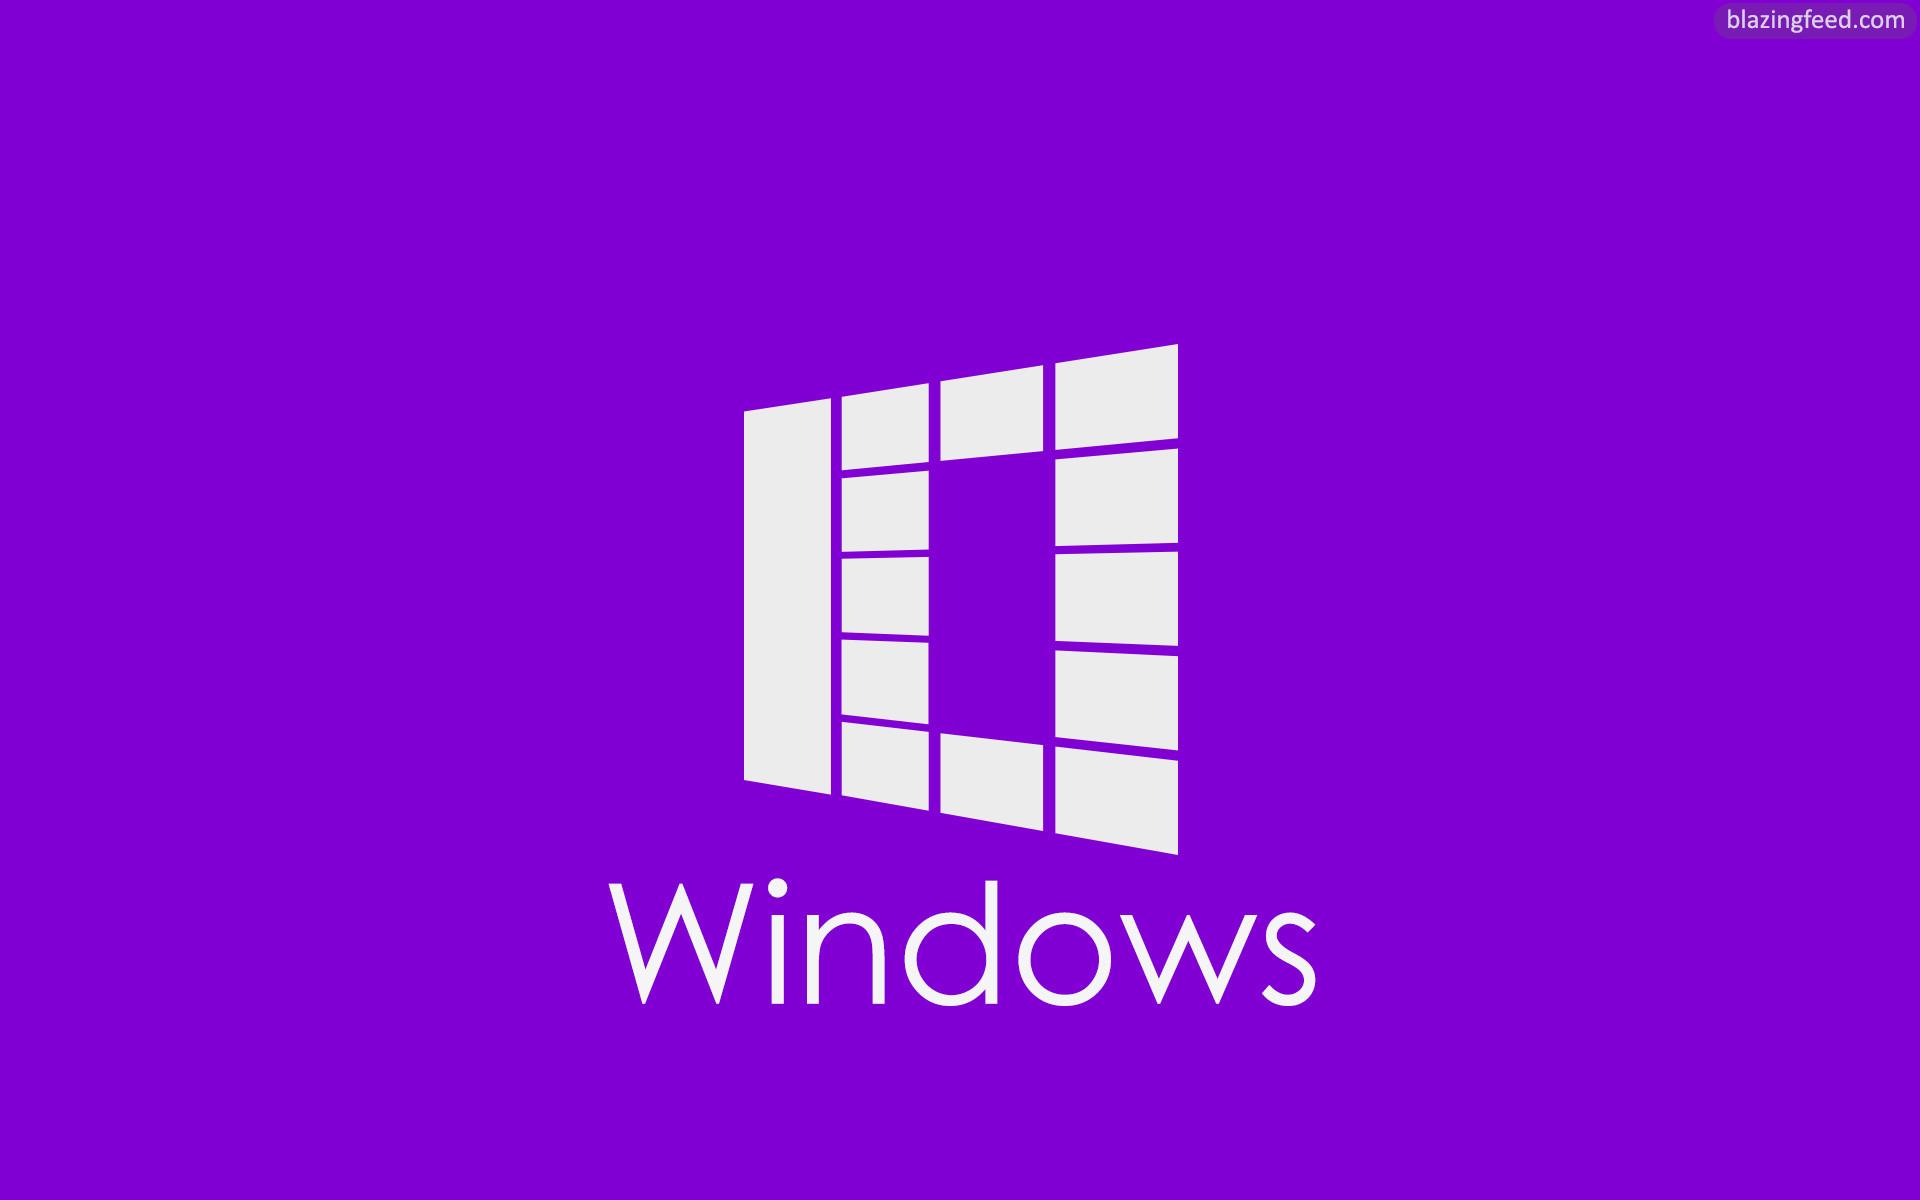 windows 10 hd wallpaper https://wallpapers.trestons.com/2015/